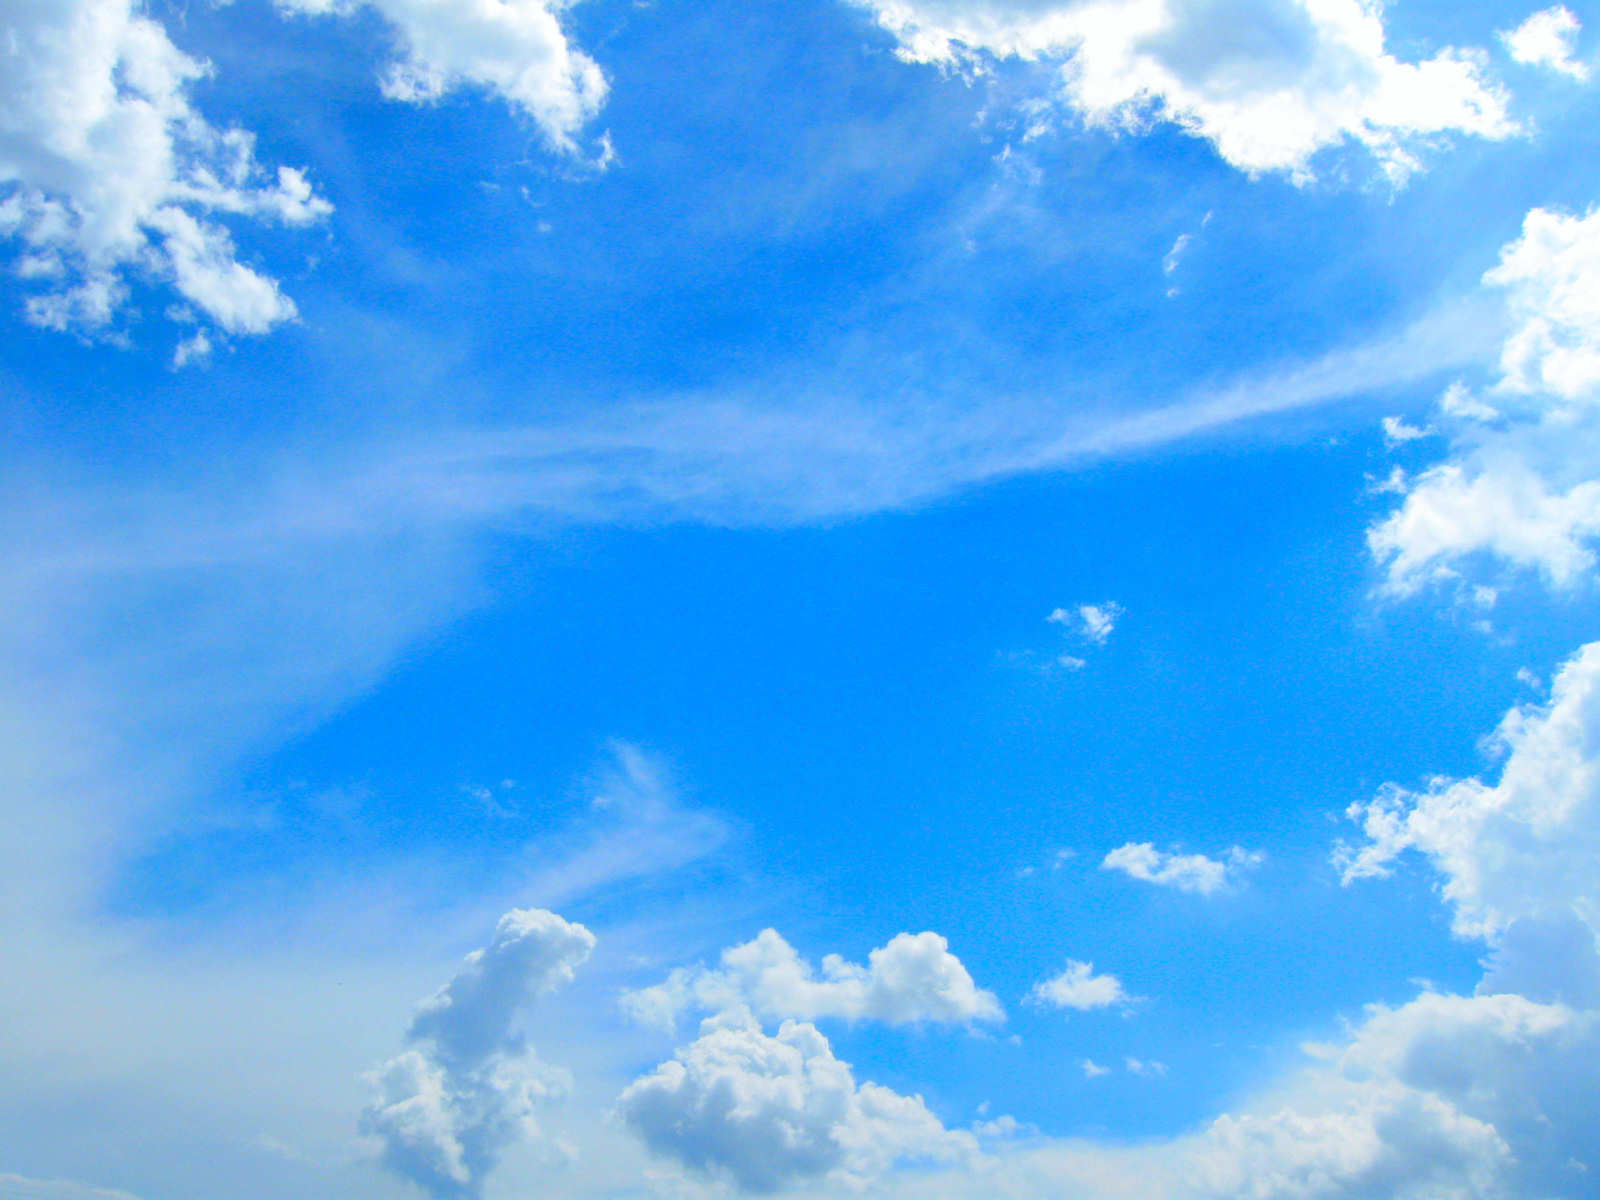 Blue Sky Wallpaper | HD Wallpapers Pulse